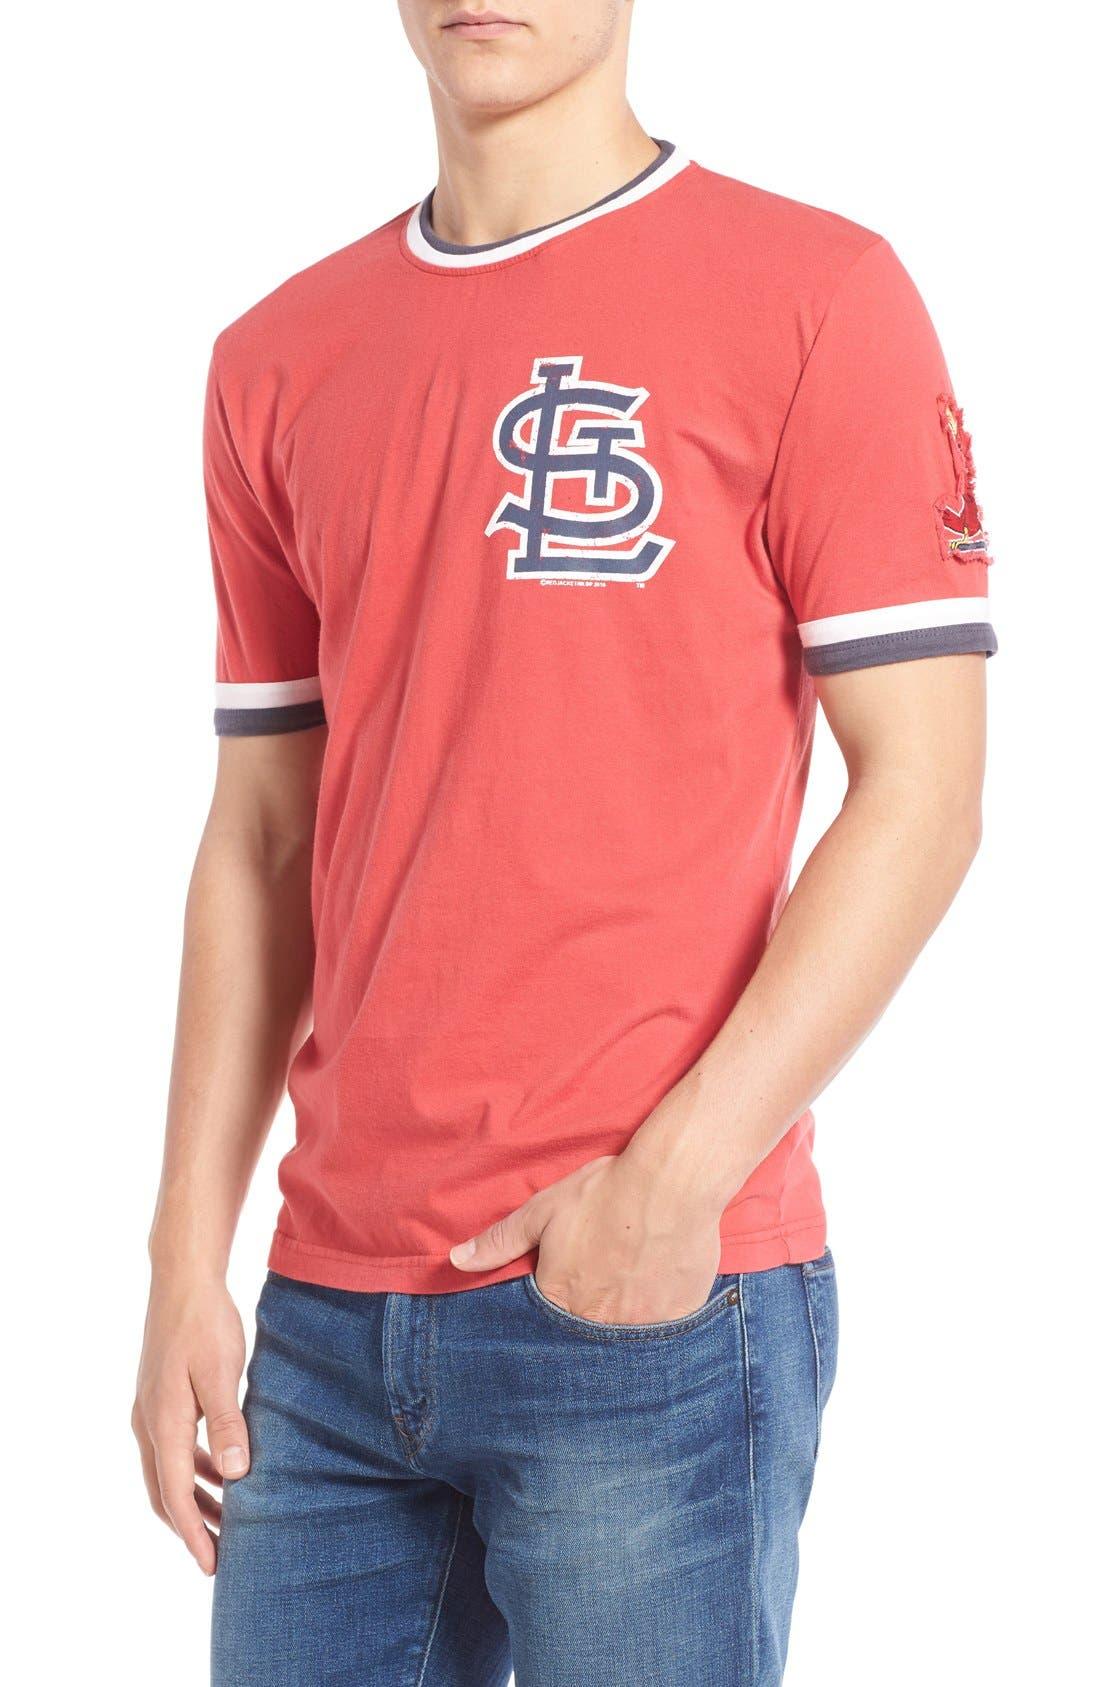 Alternate Image 1 Selected - Red Jacket 'Saint Louis Cardinals - Remote Control' Trim Fit T-Shirt